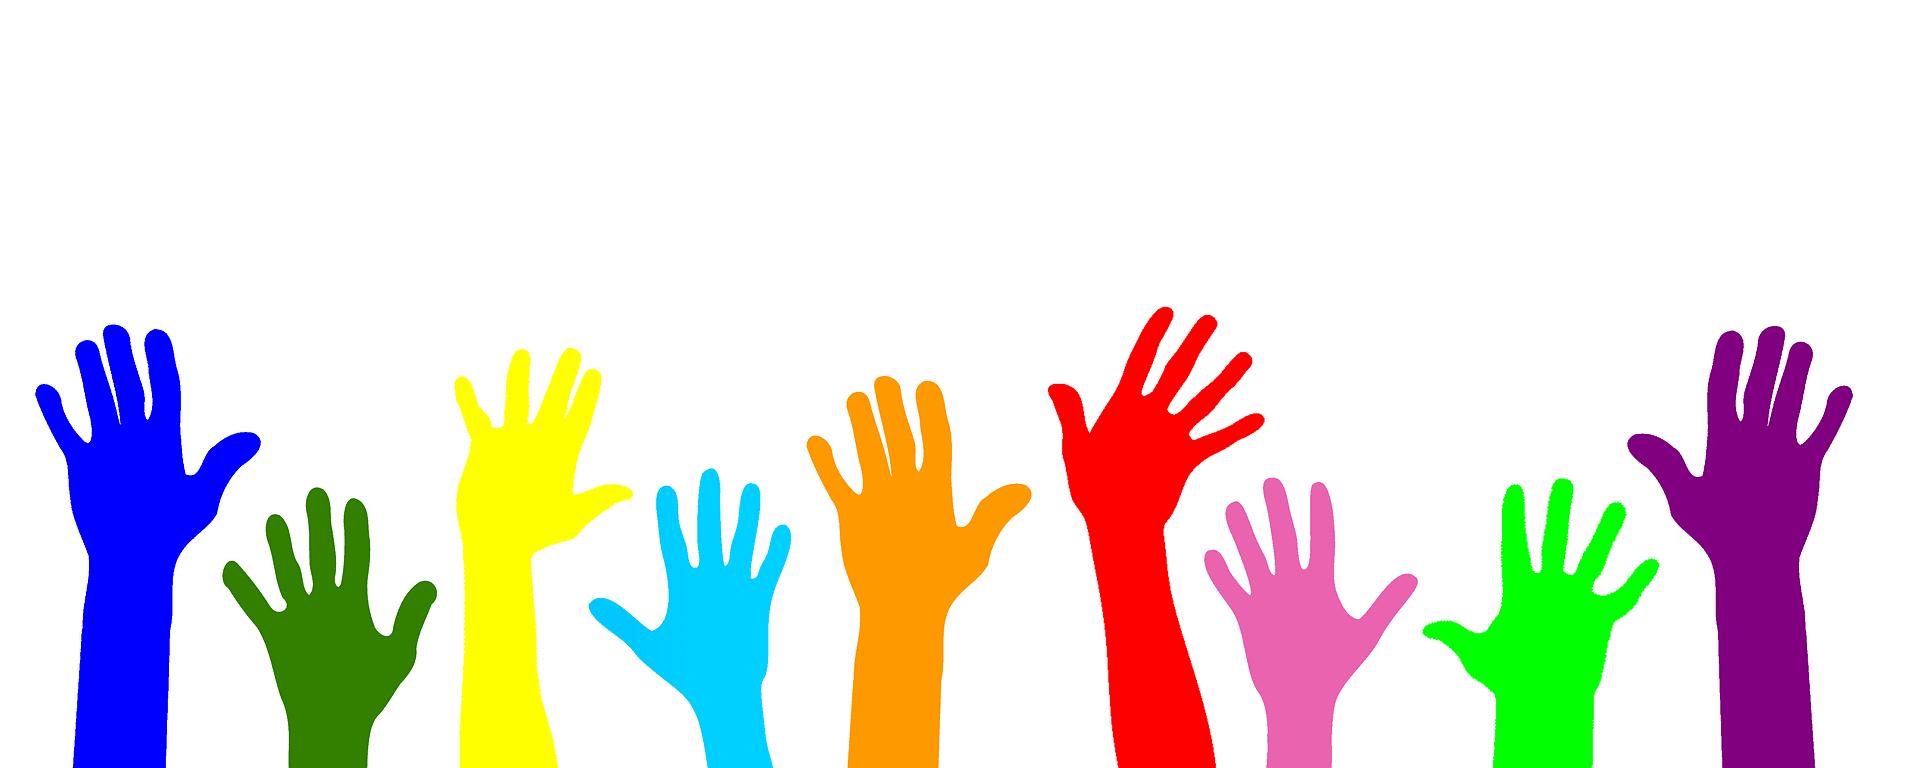 Prostovoljstvo. Vir: Pixabay